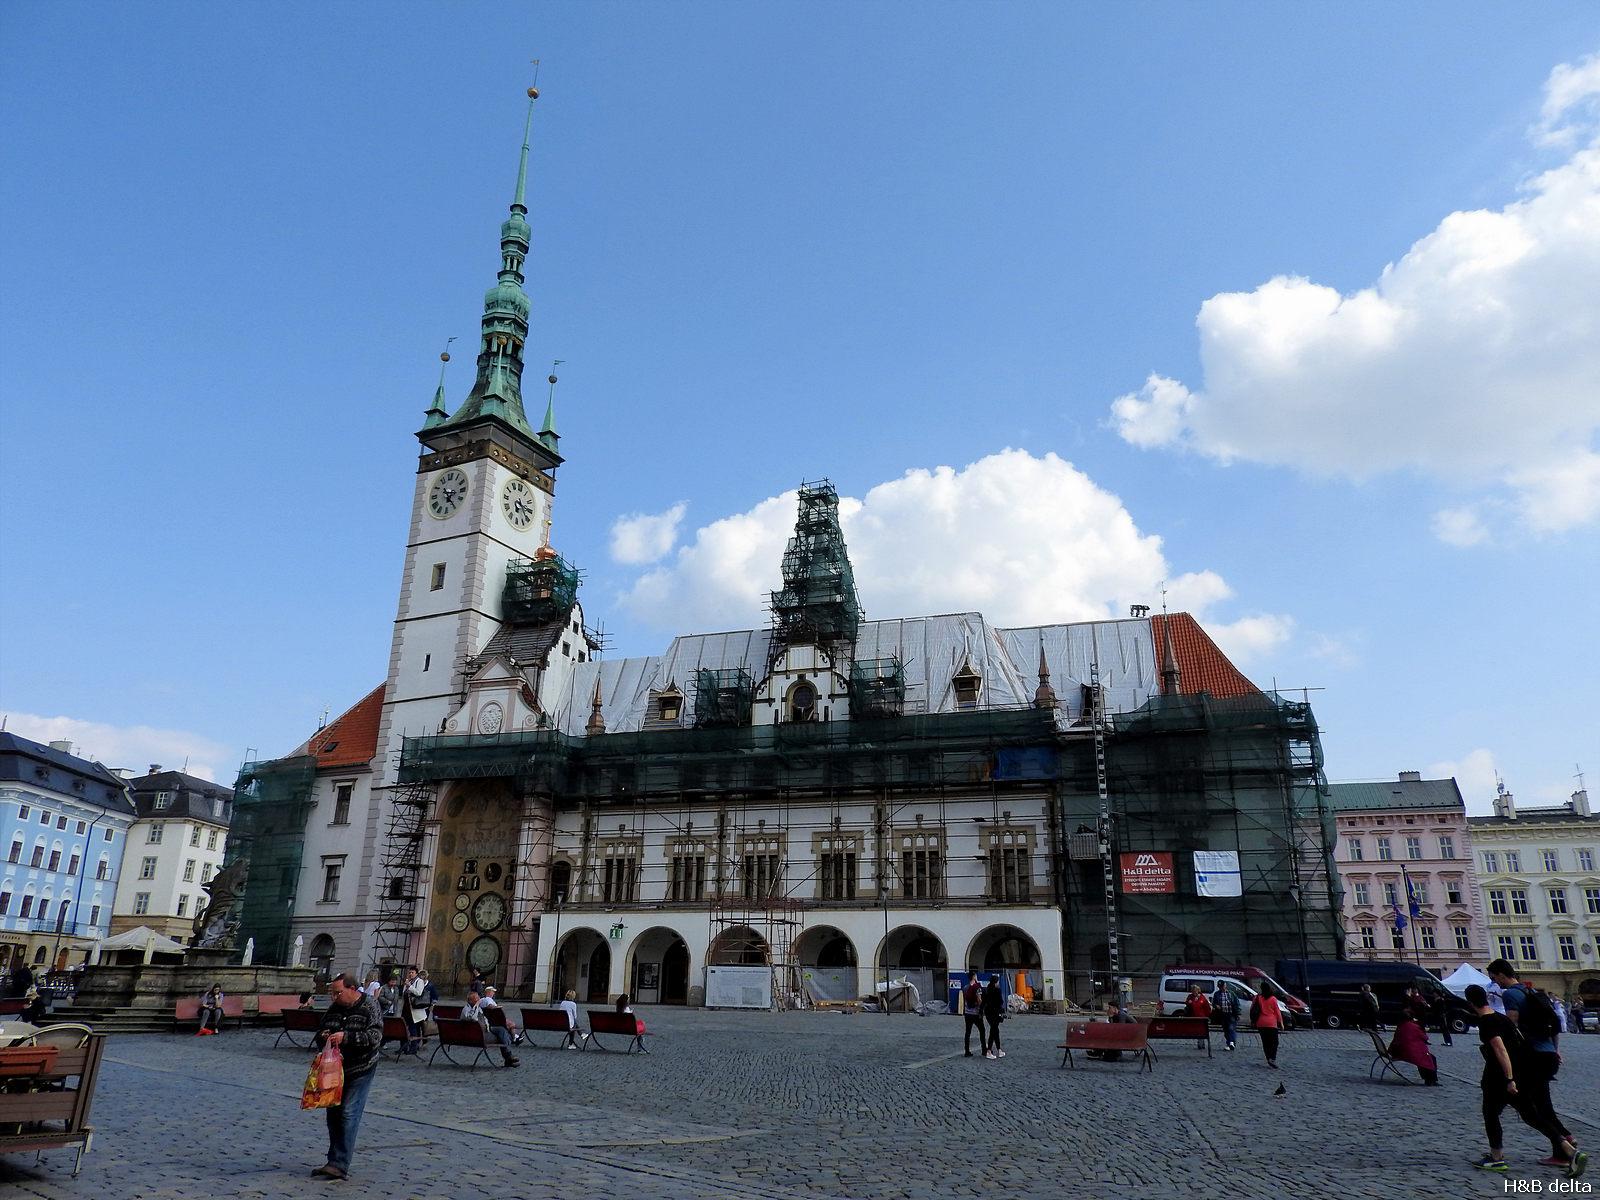 Radnice Olomouc